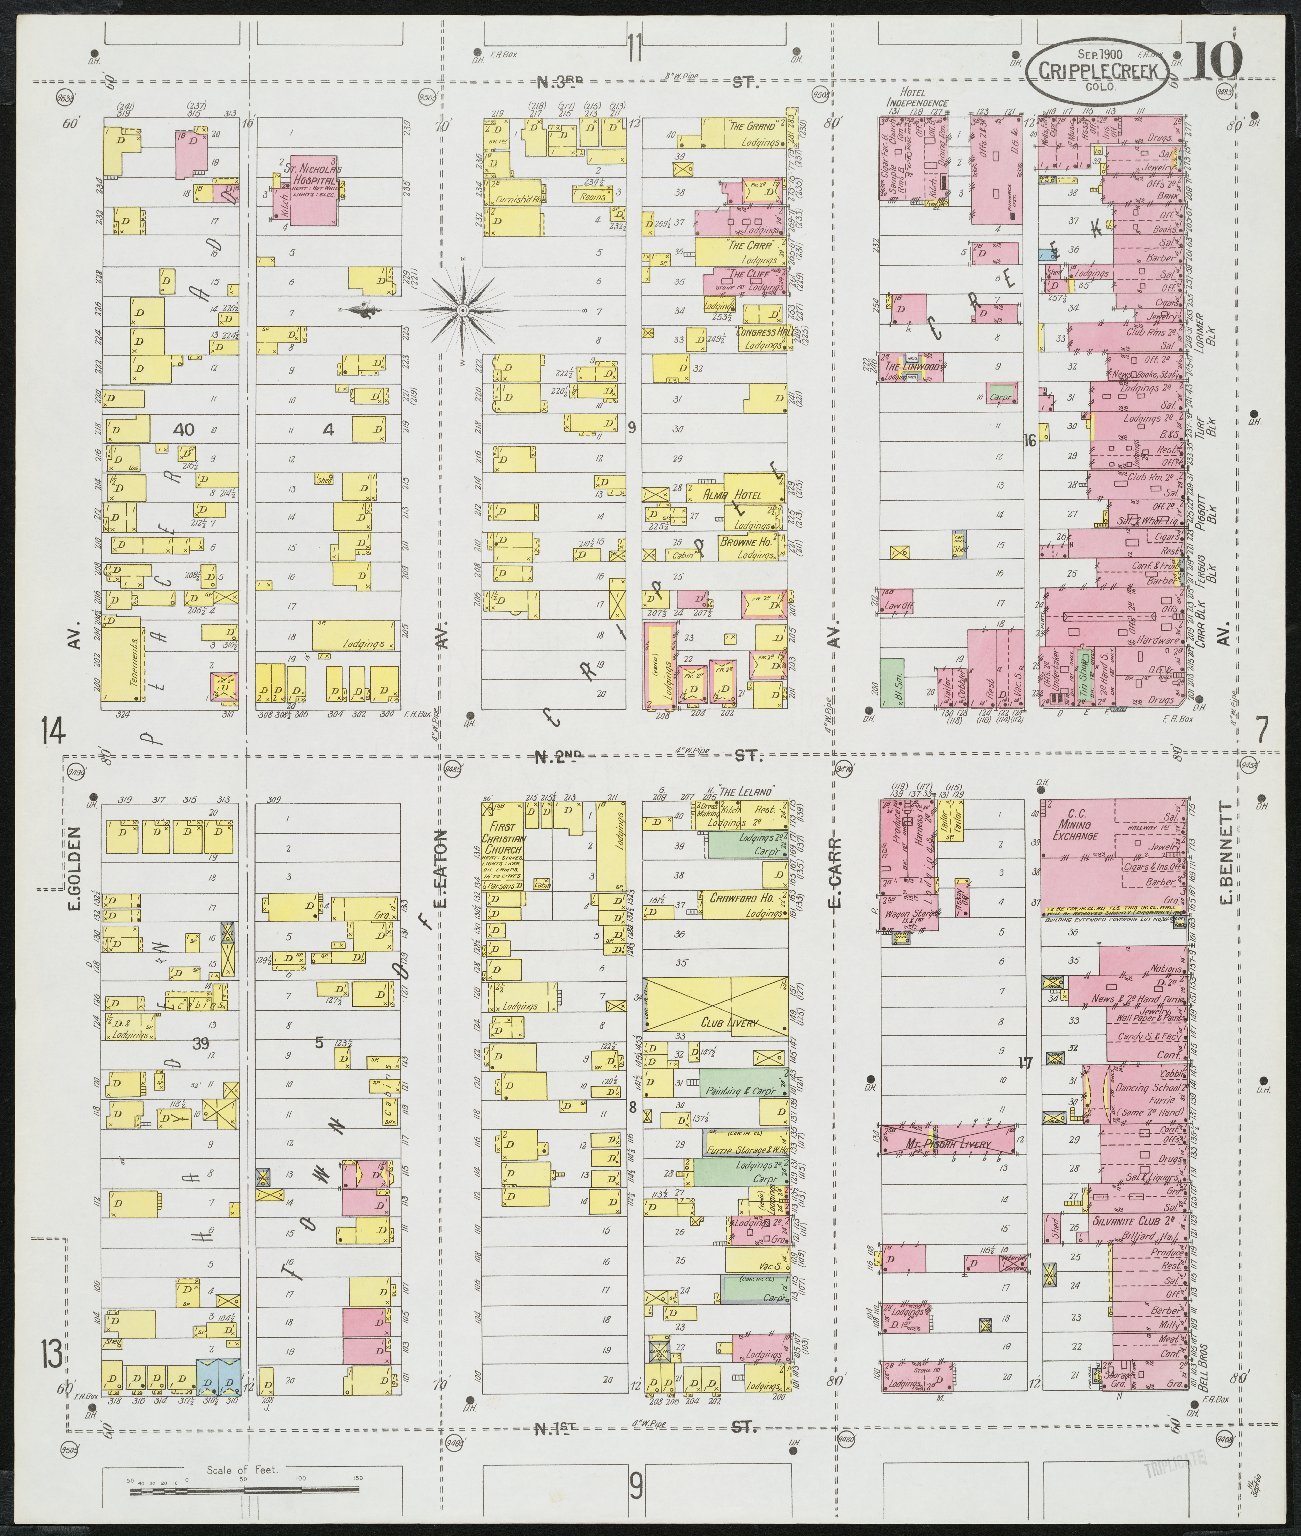 Insurance maps of Cripple Creek, including Anaconda and Gillett, Colorado